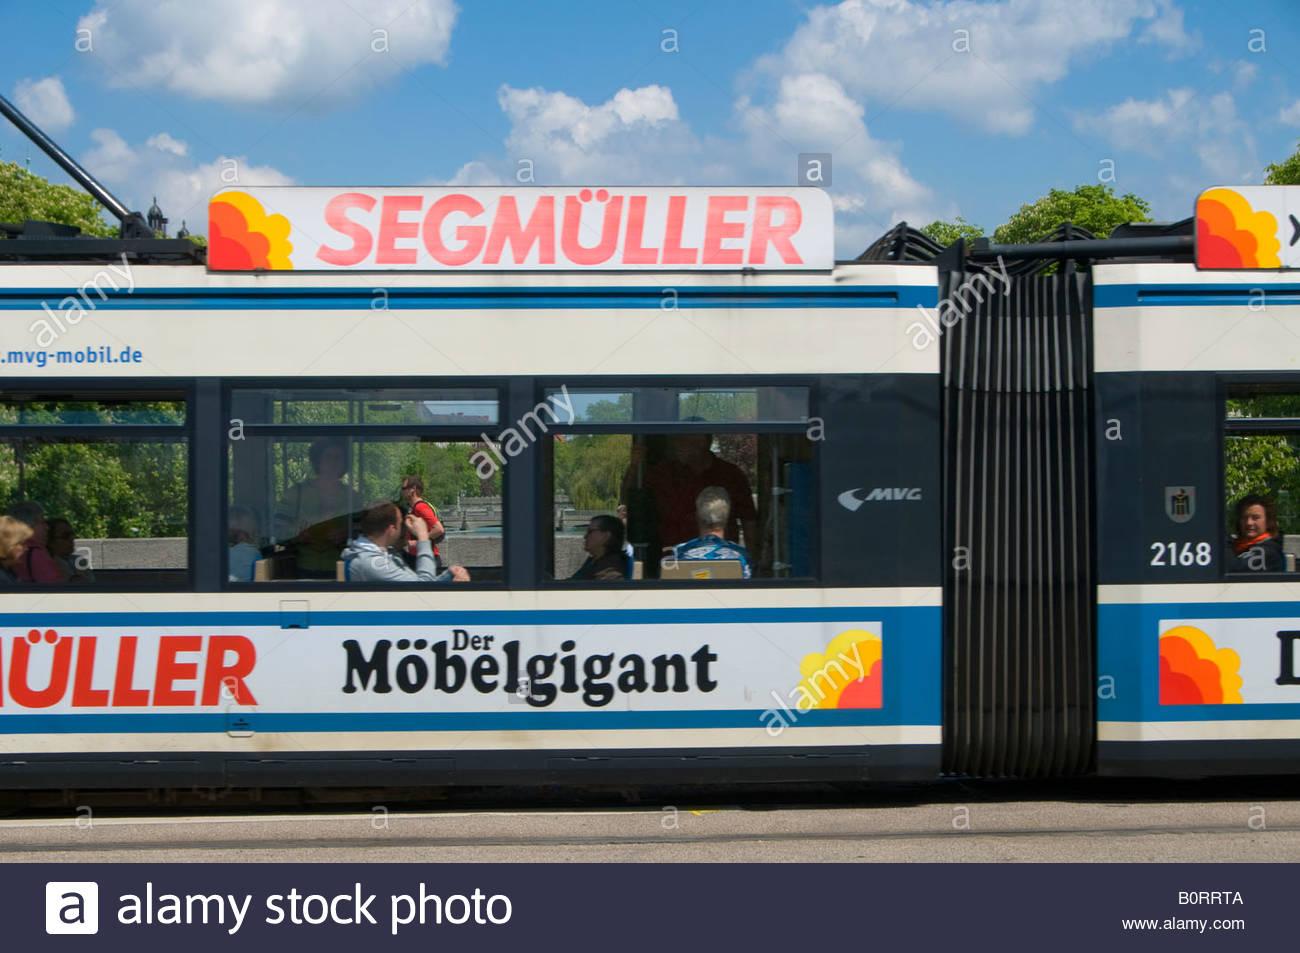 Munich Tram Stock Photos & Munich Tram Stock Images - Alamy